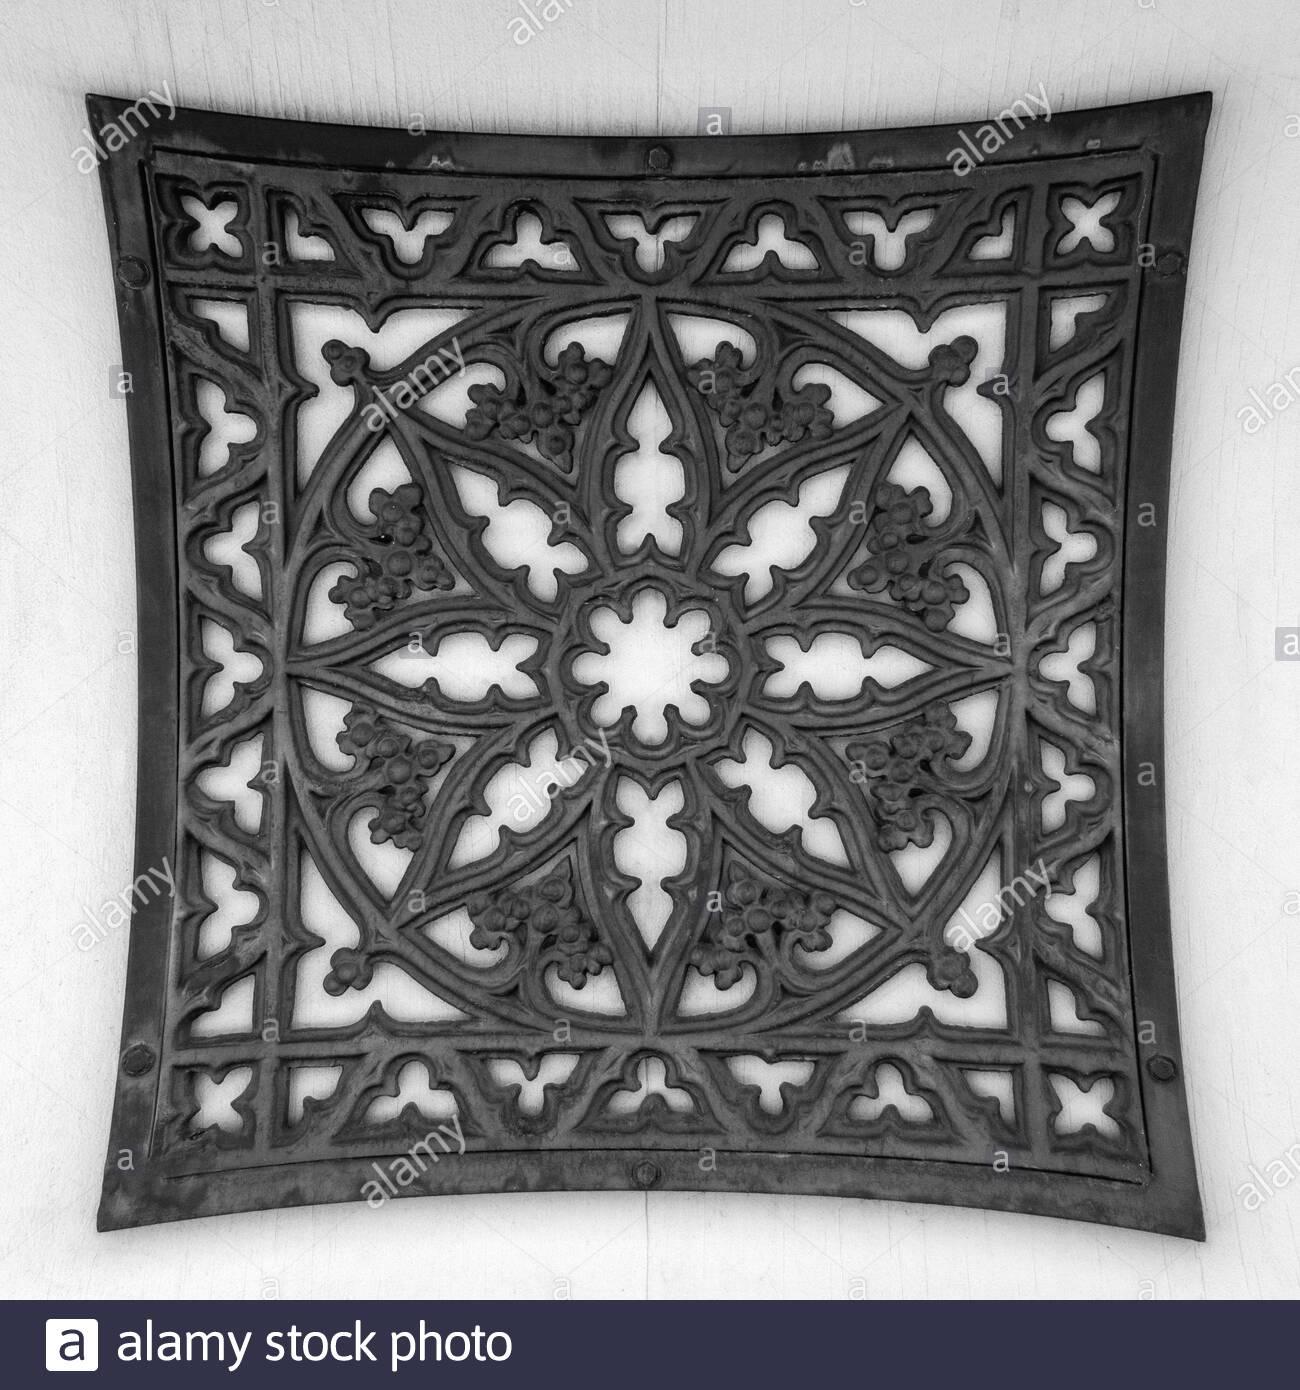 Image of: Large Square Black Wrought Iron Wall Decor Stock Photo Alamy